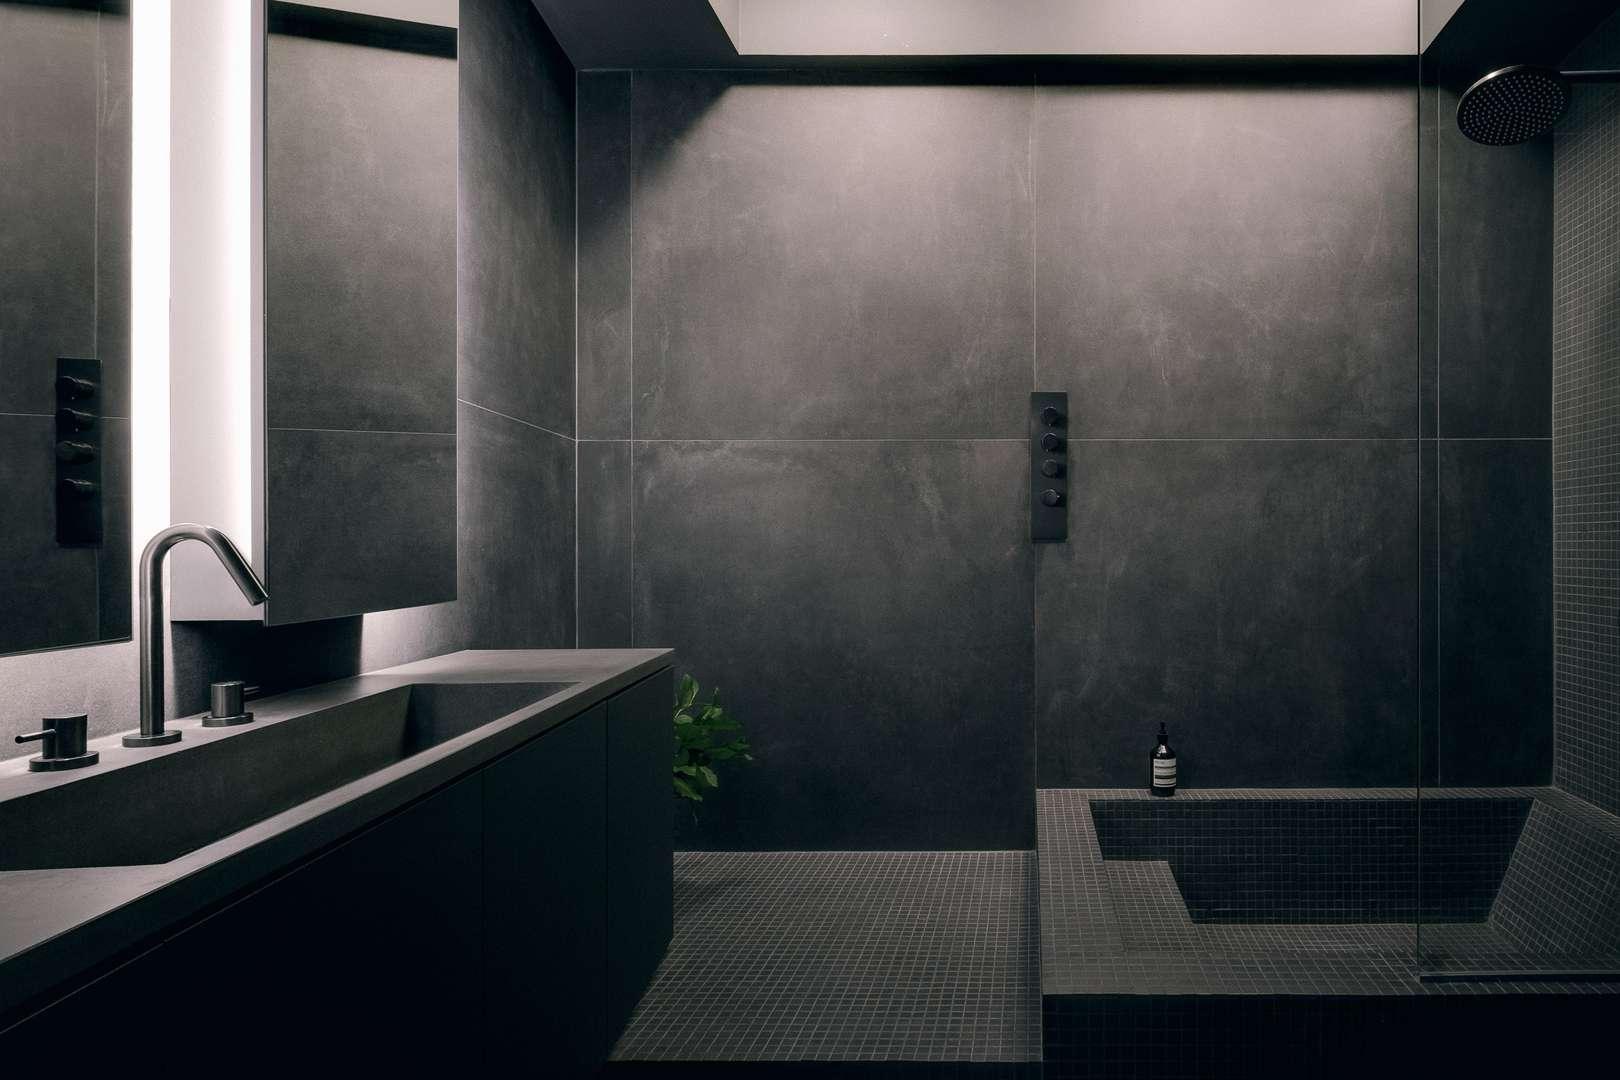 montreal-loft-renovation-by-future-simple-studio-interiors-canada_dezeen_2364_col_17